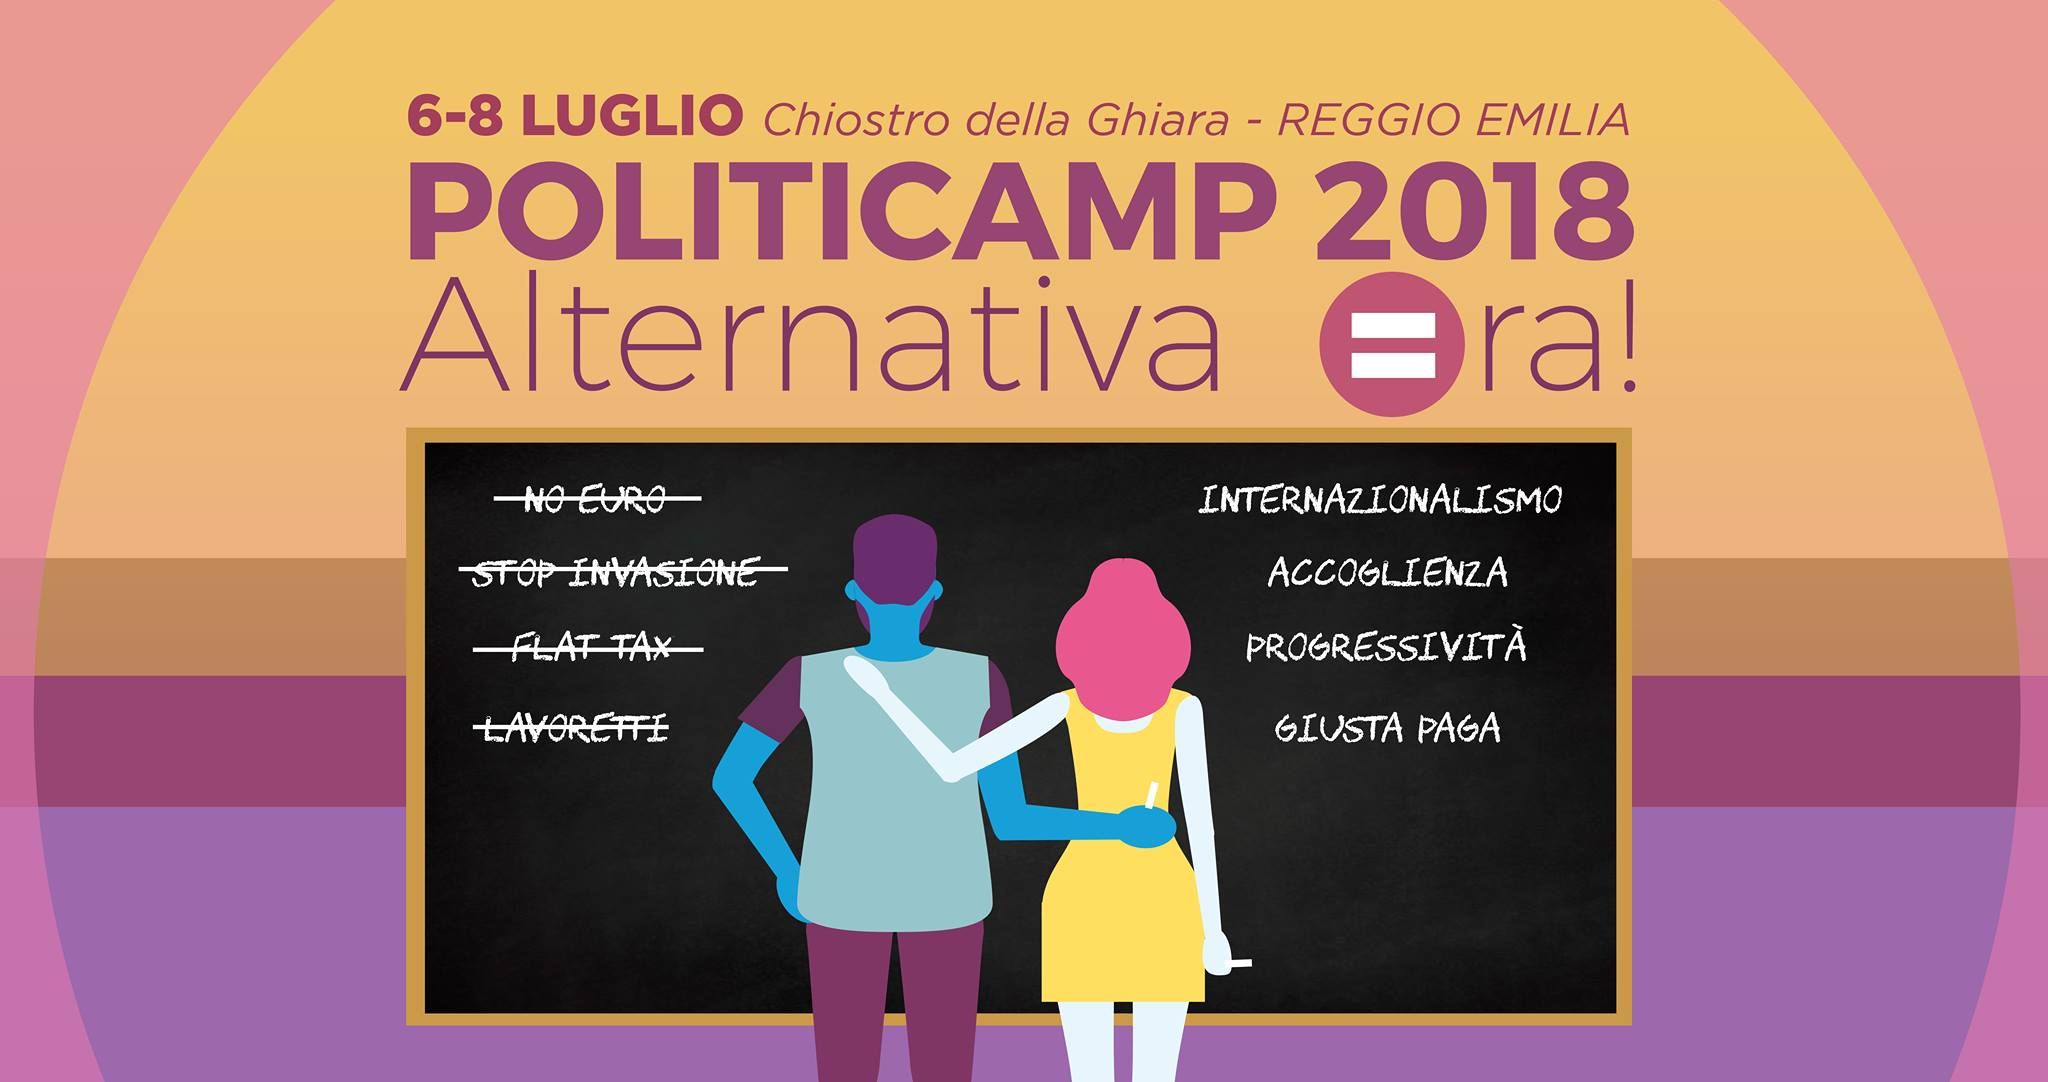 PolitiCamp 2018: Alternativa ora!